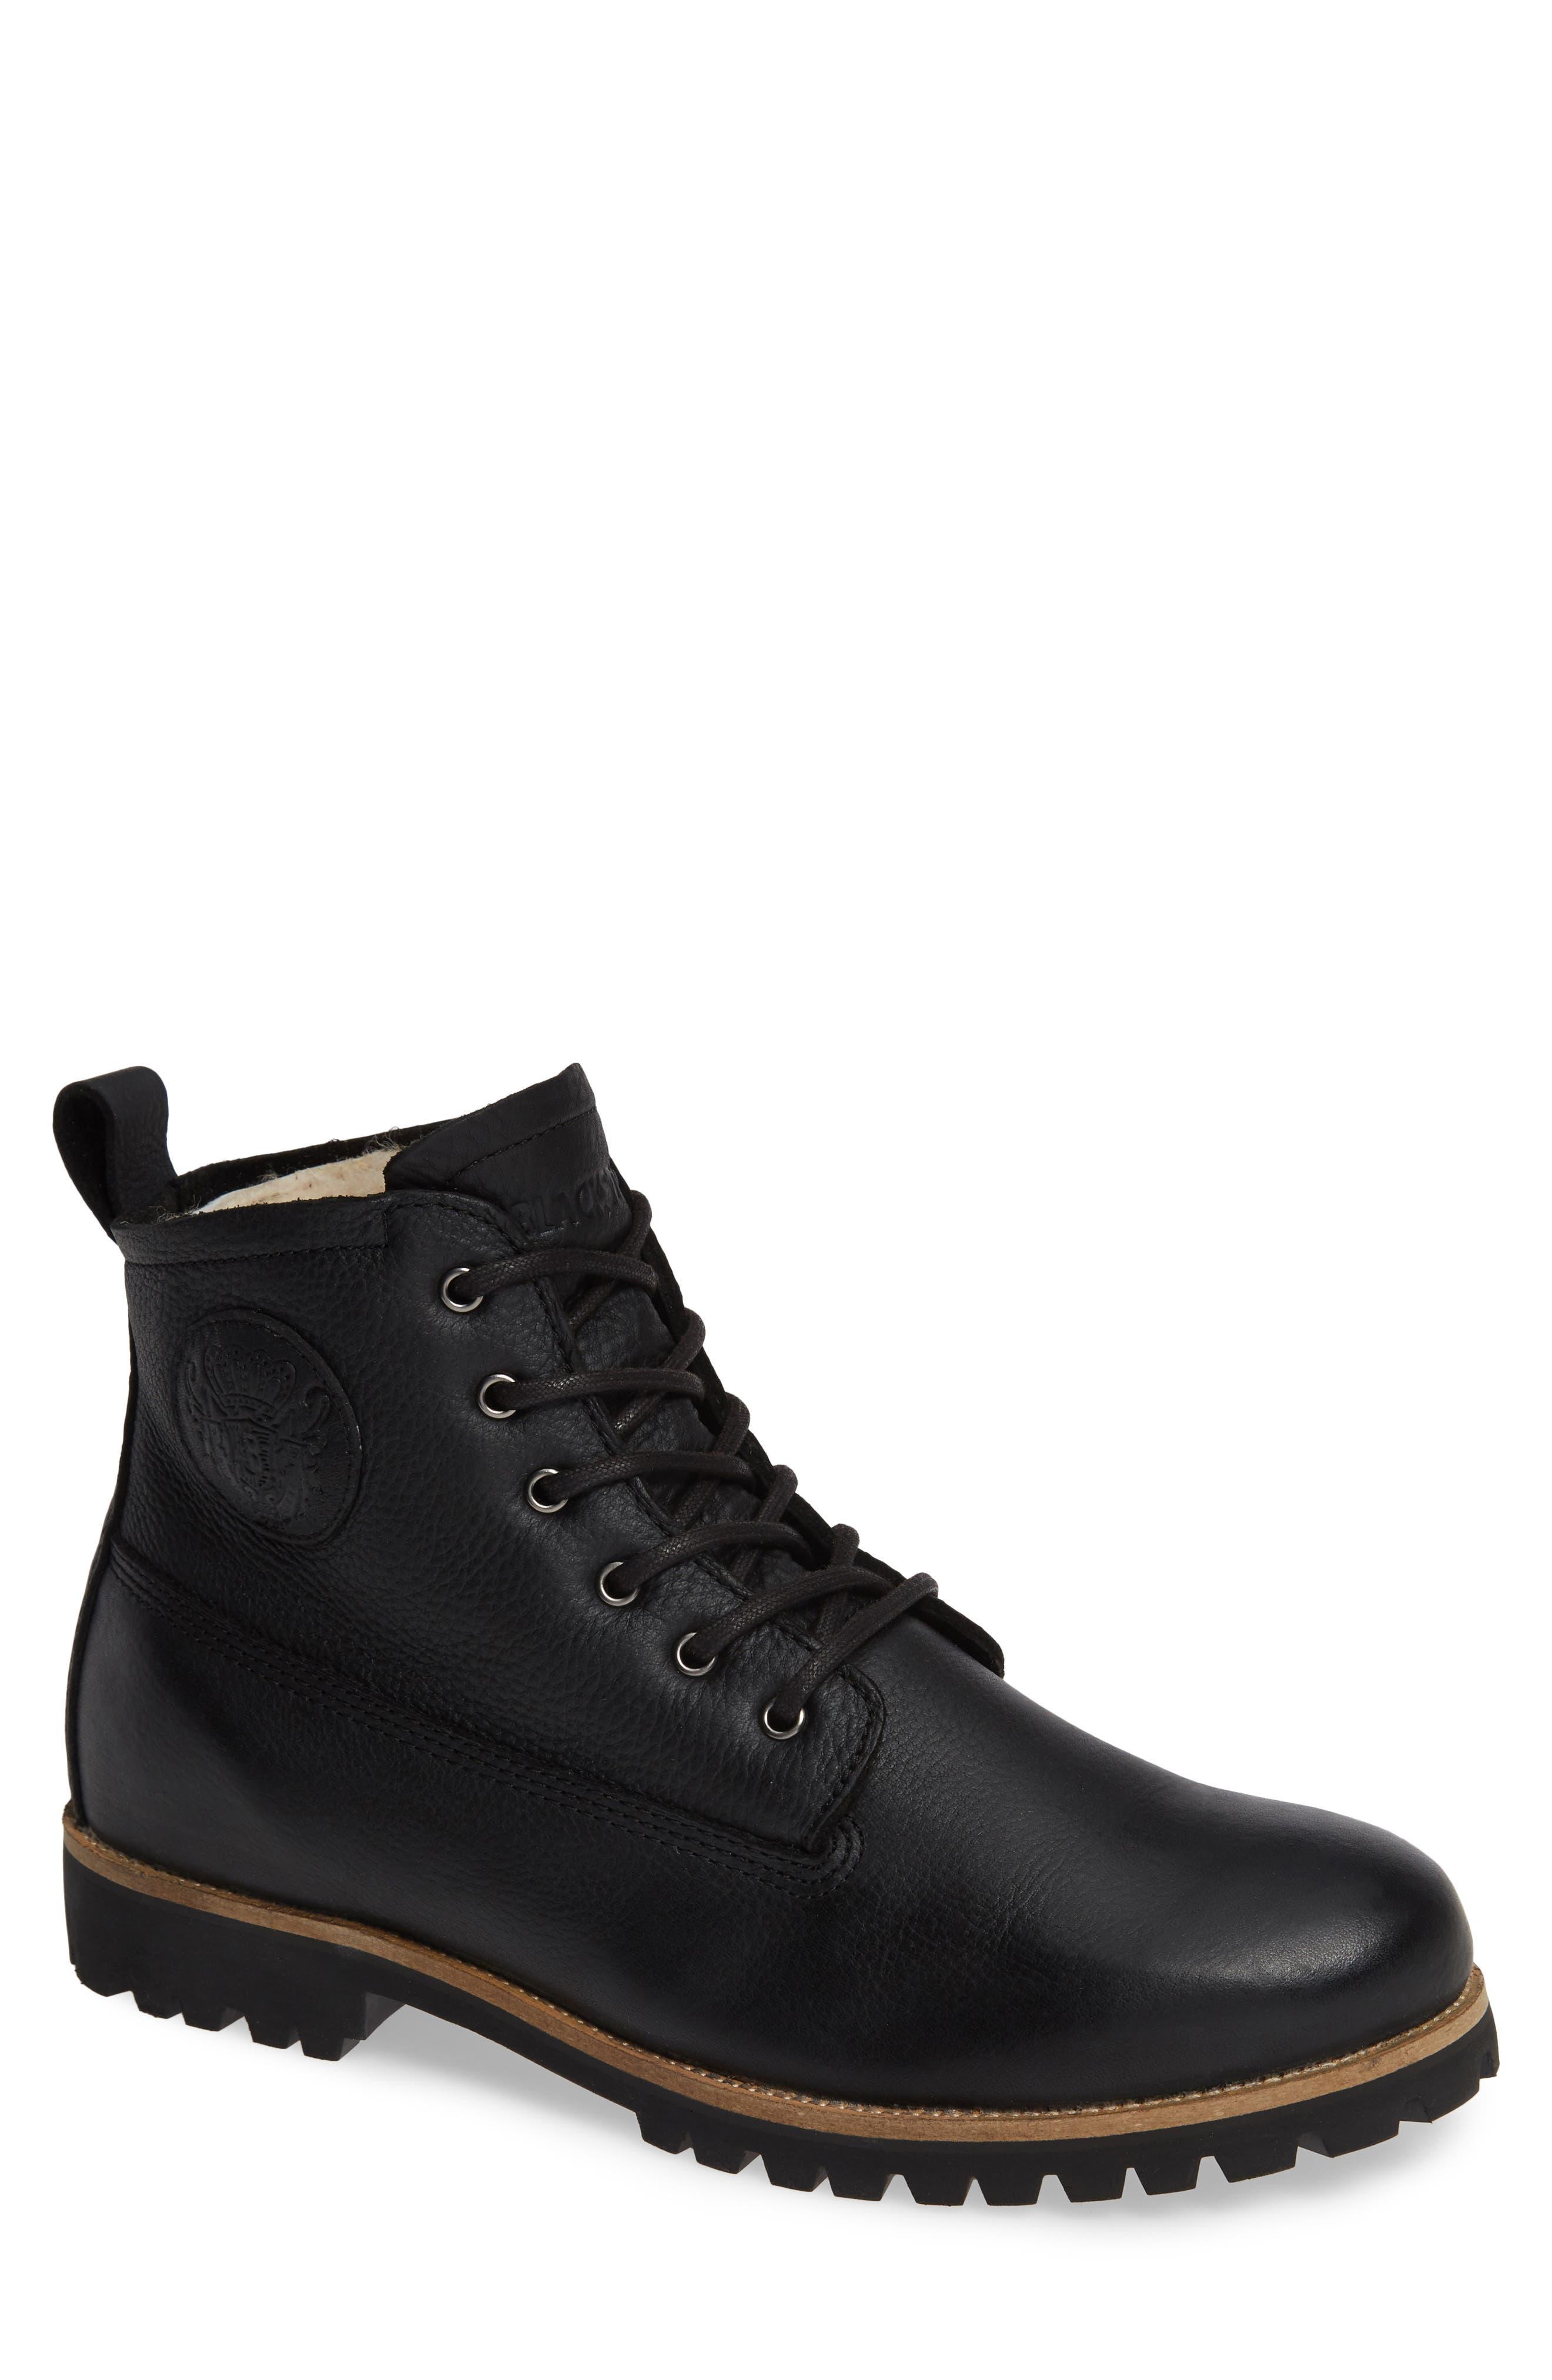 OM60 Waterproof Genuine Shearling Boot,                             Main thumbnail 1, color,                             BLACK